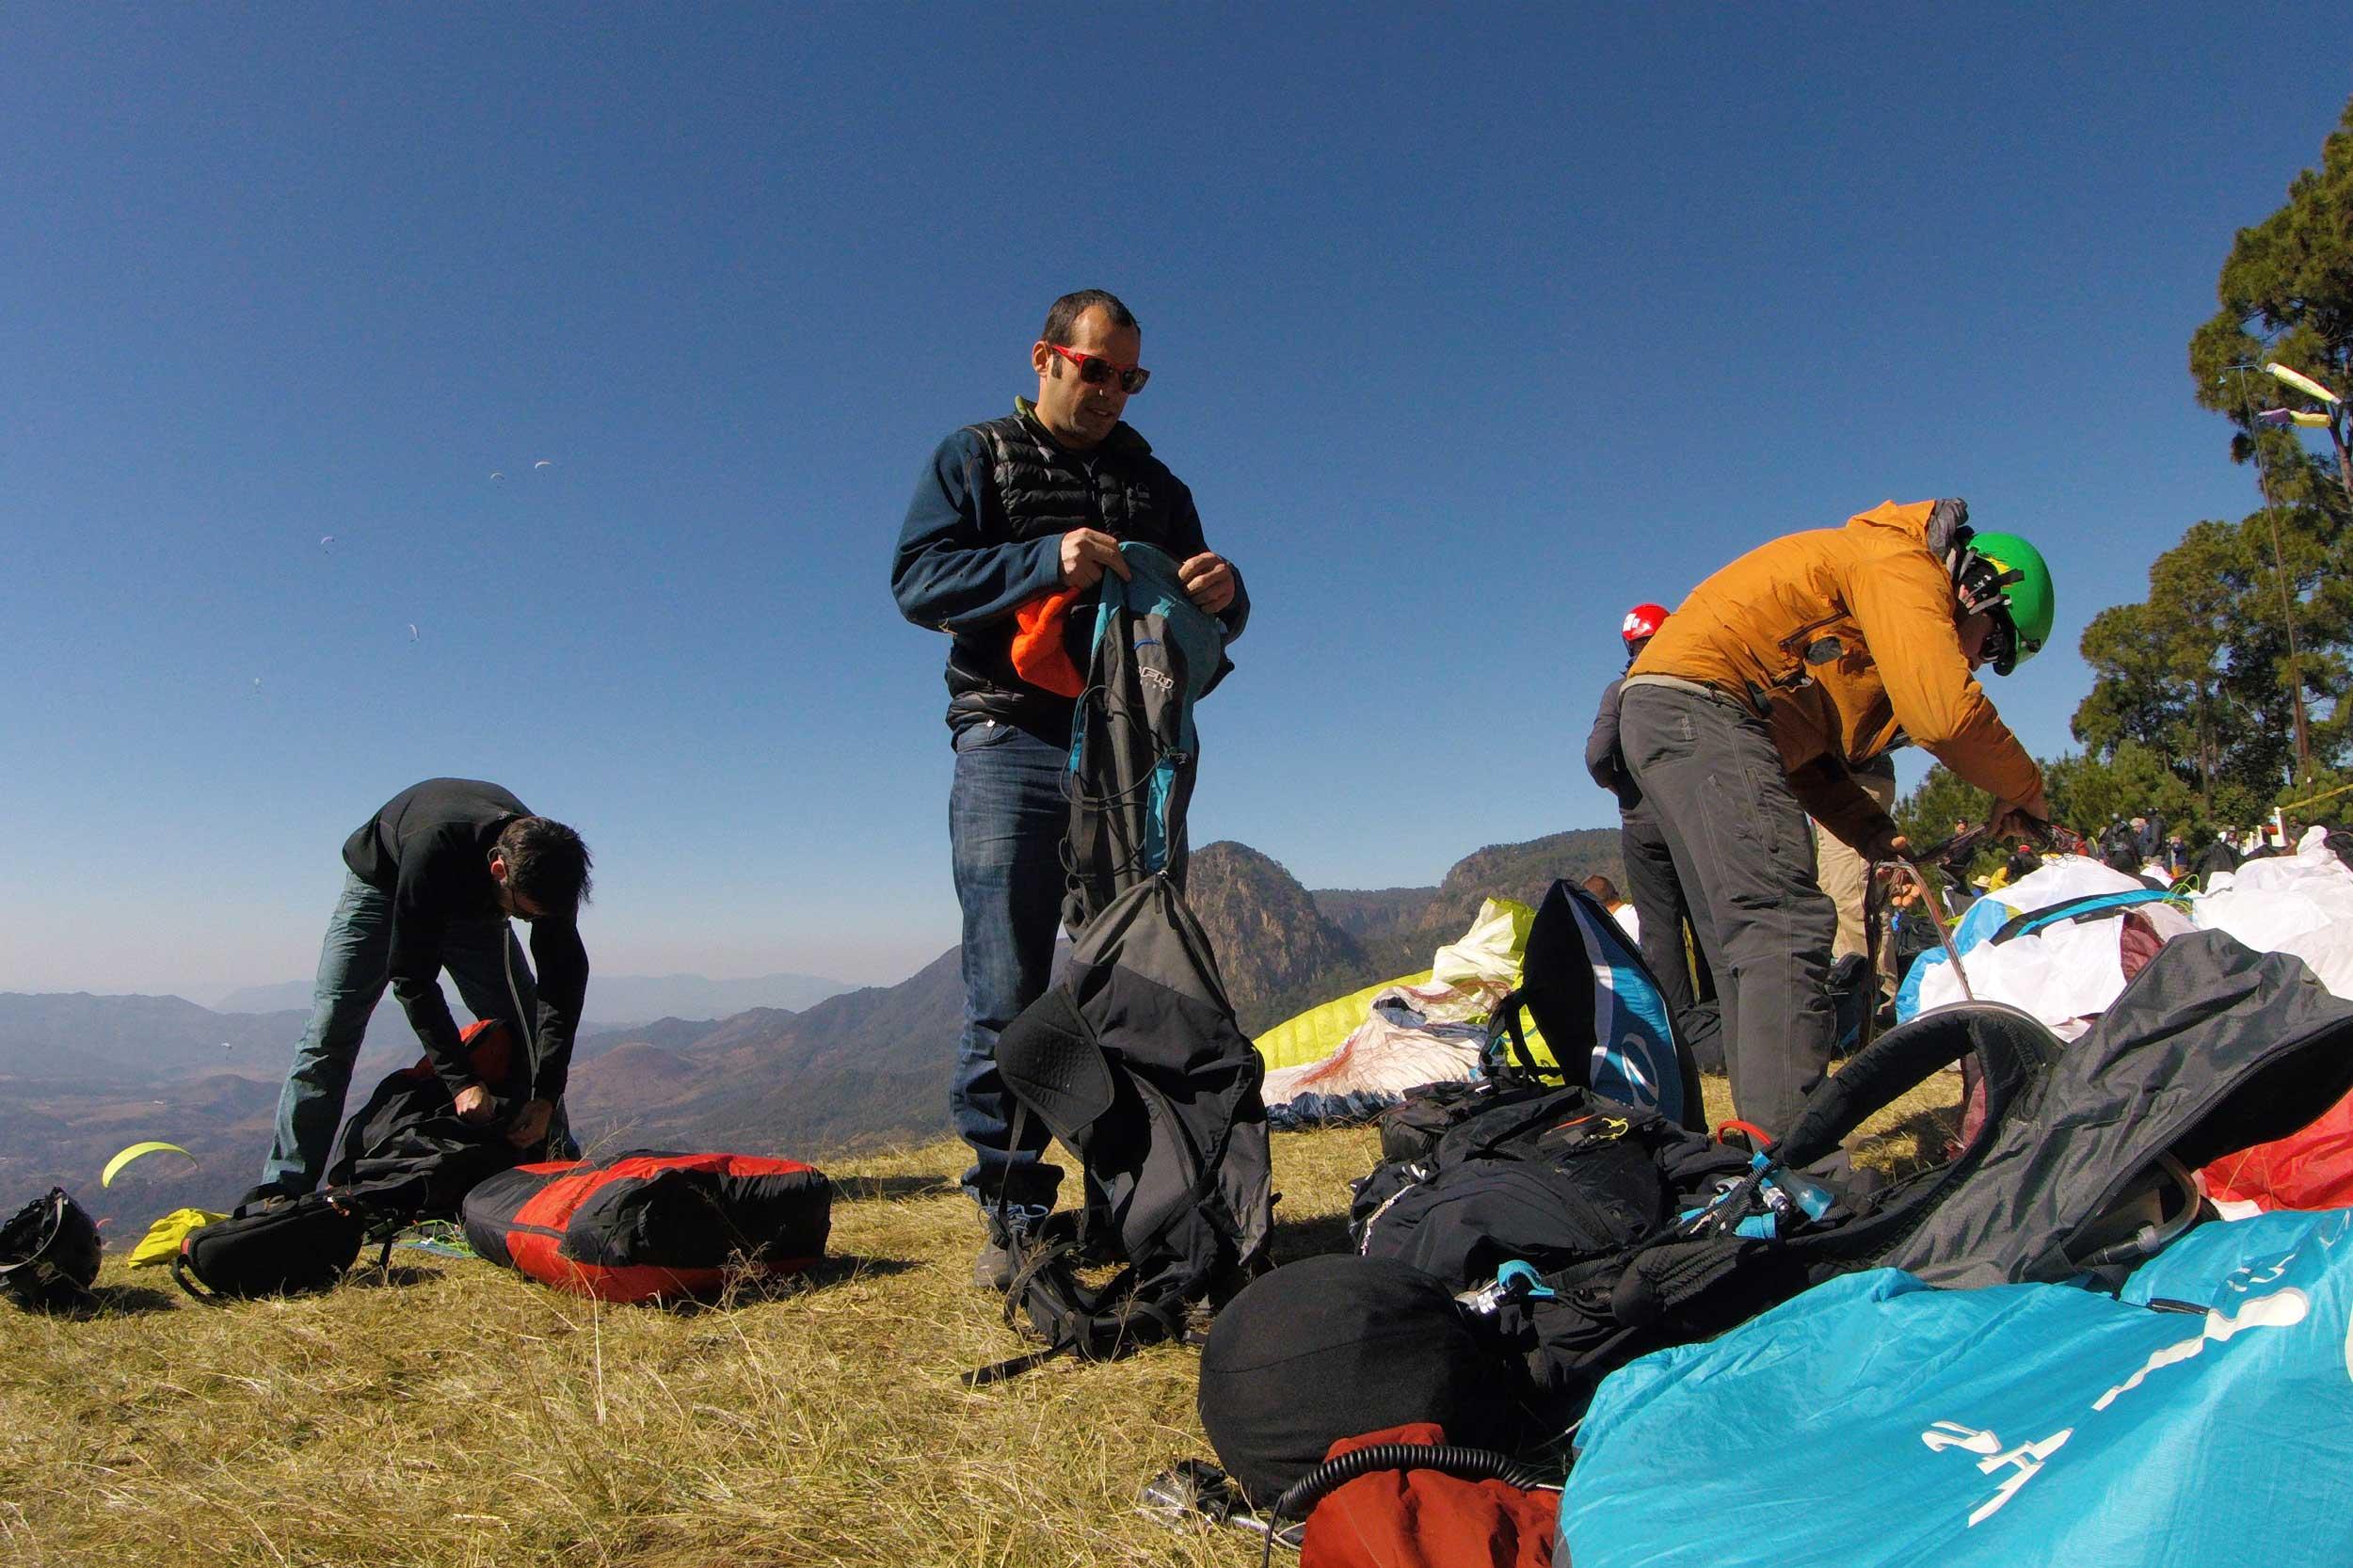 Paraglide-New-England-Trips-Valle-de-Bravo-Mexico-Gallery-Calef-Prep.jpg